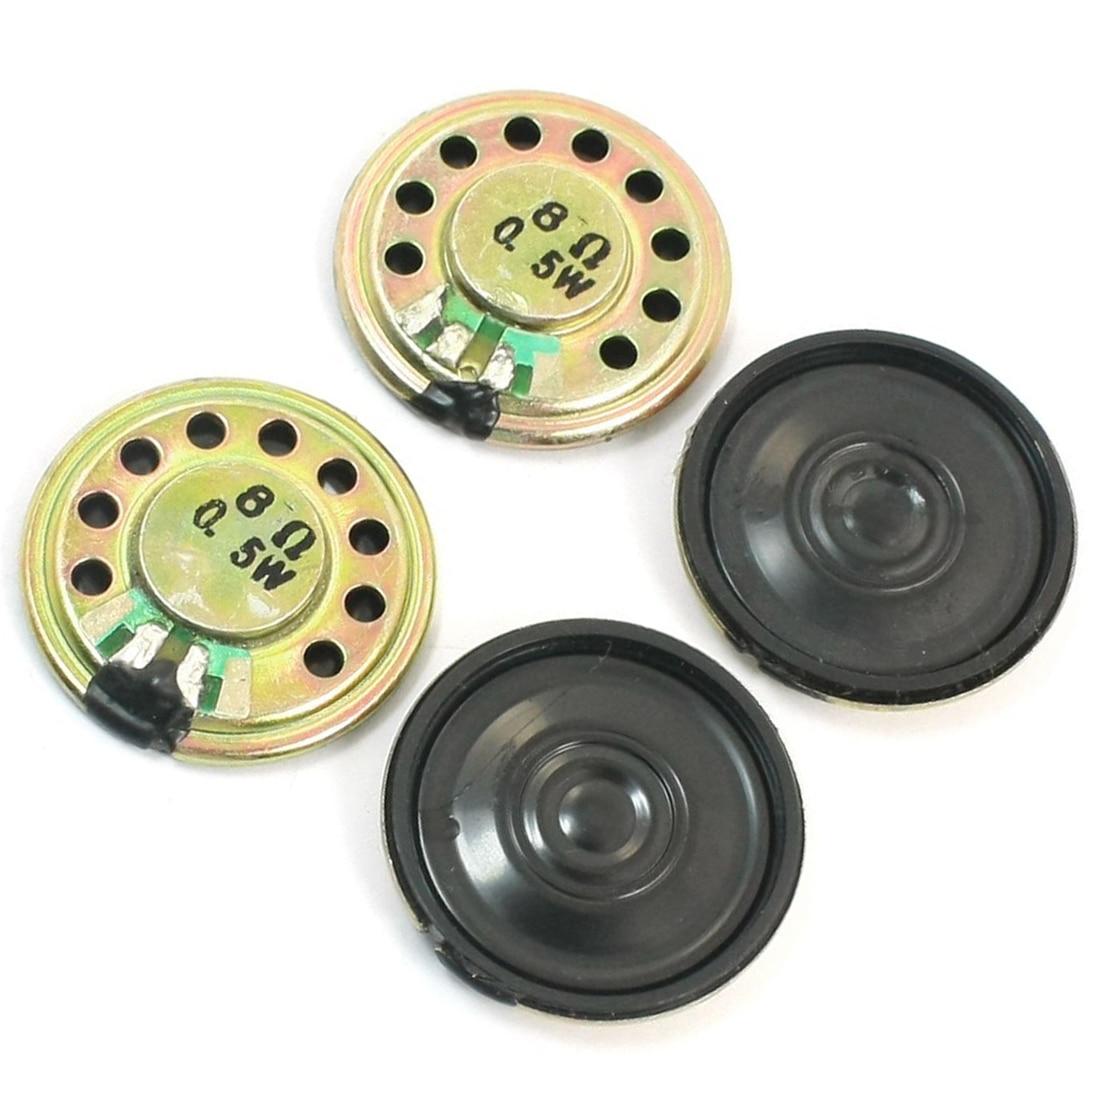 HFES 4Pcs 0.5W 8 Ohm 28mm Dia Mini Metal Inside Magnet Music Player Speaker